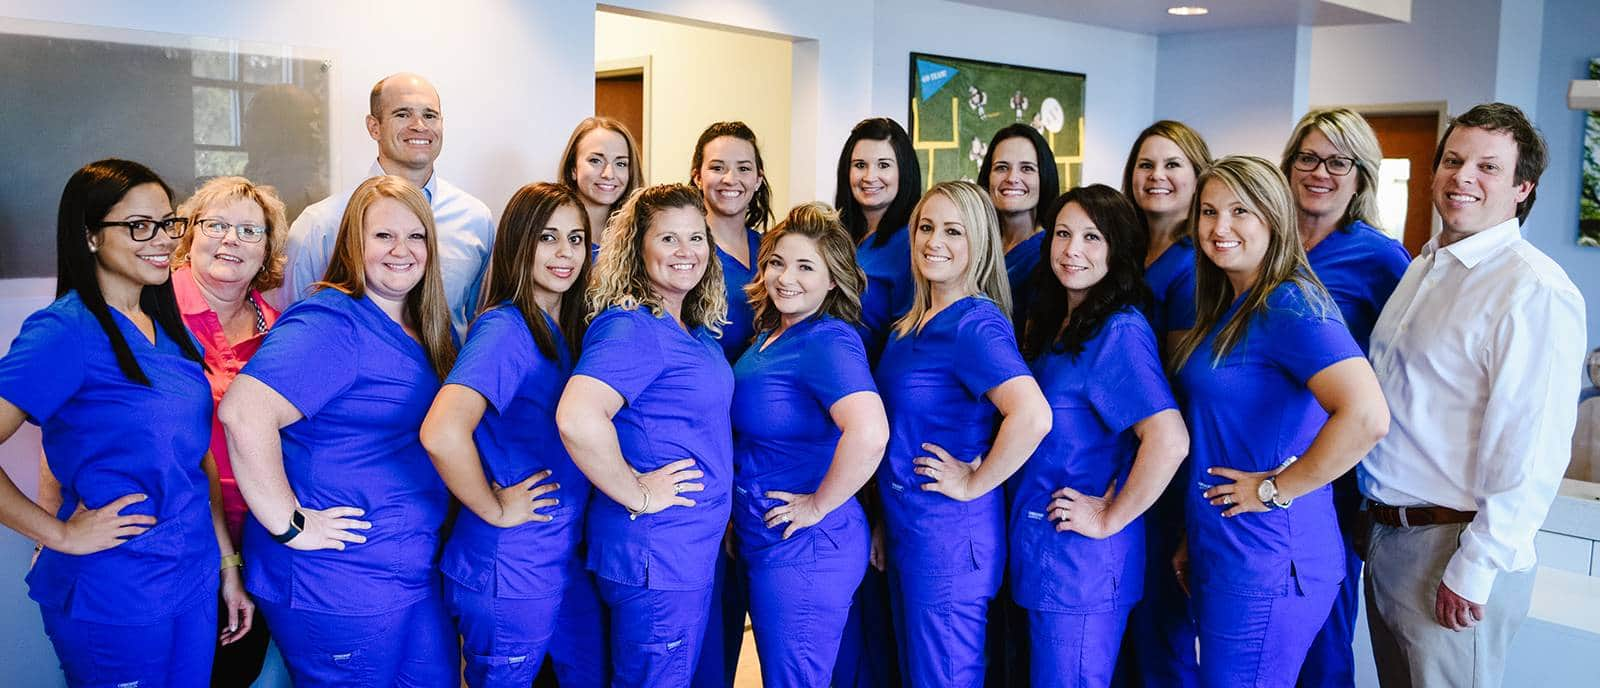 Our Team | Triangle Pediatric Dentistry